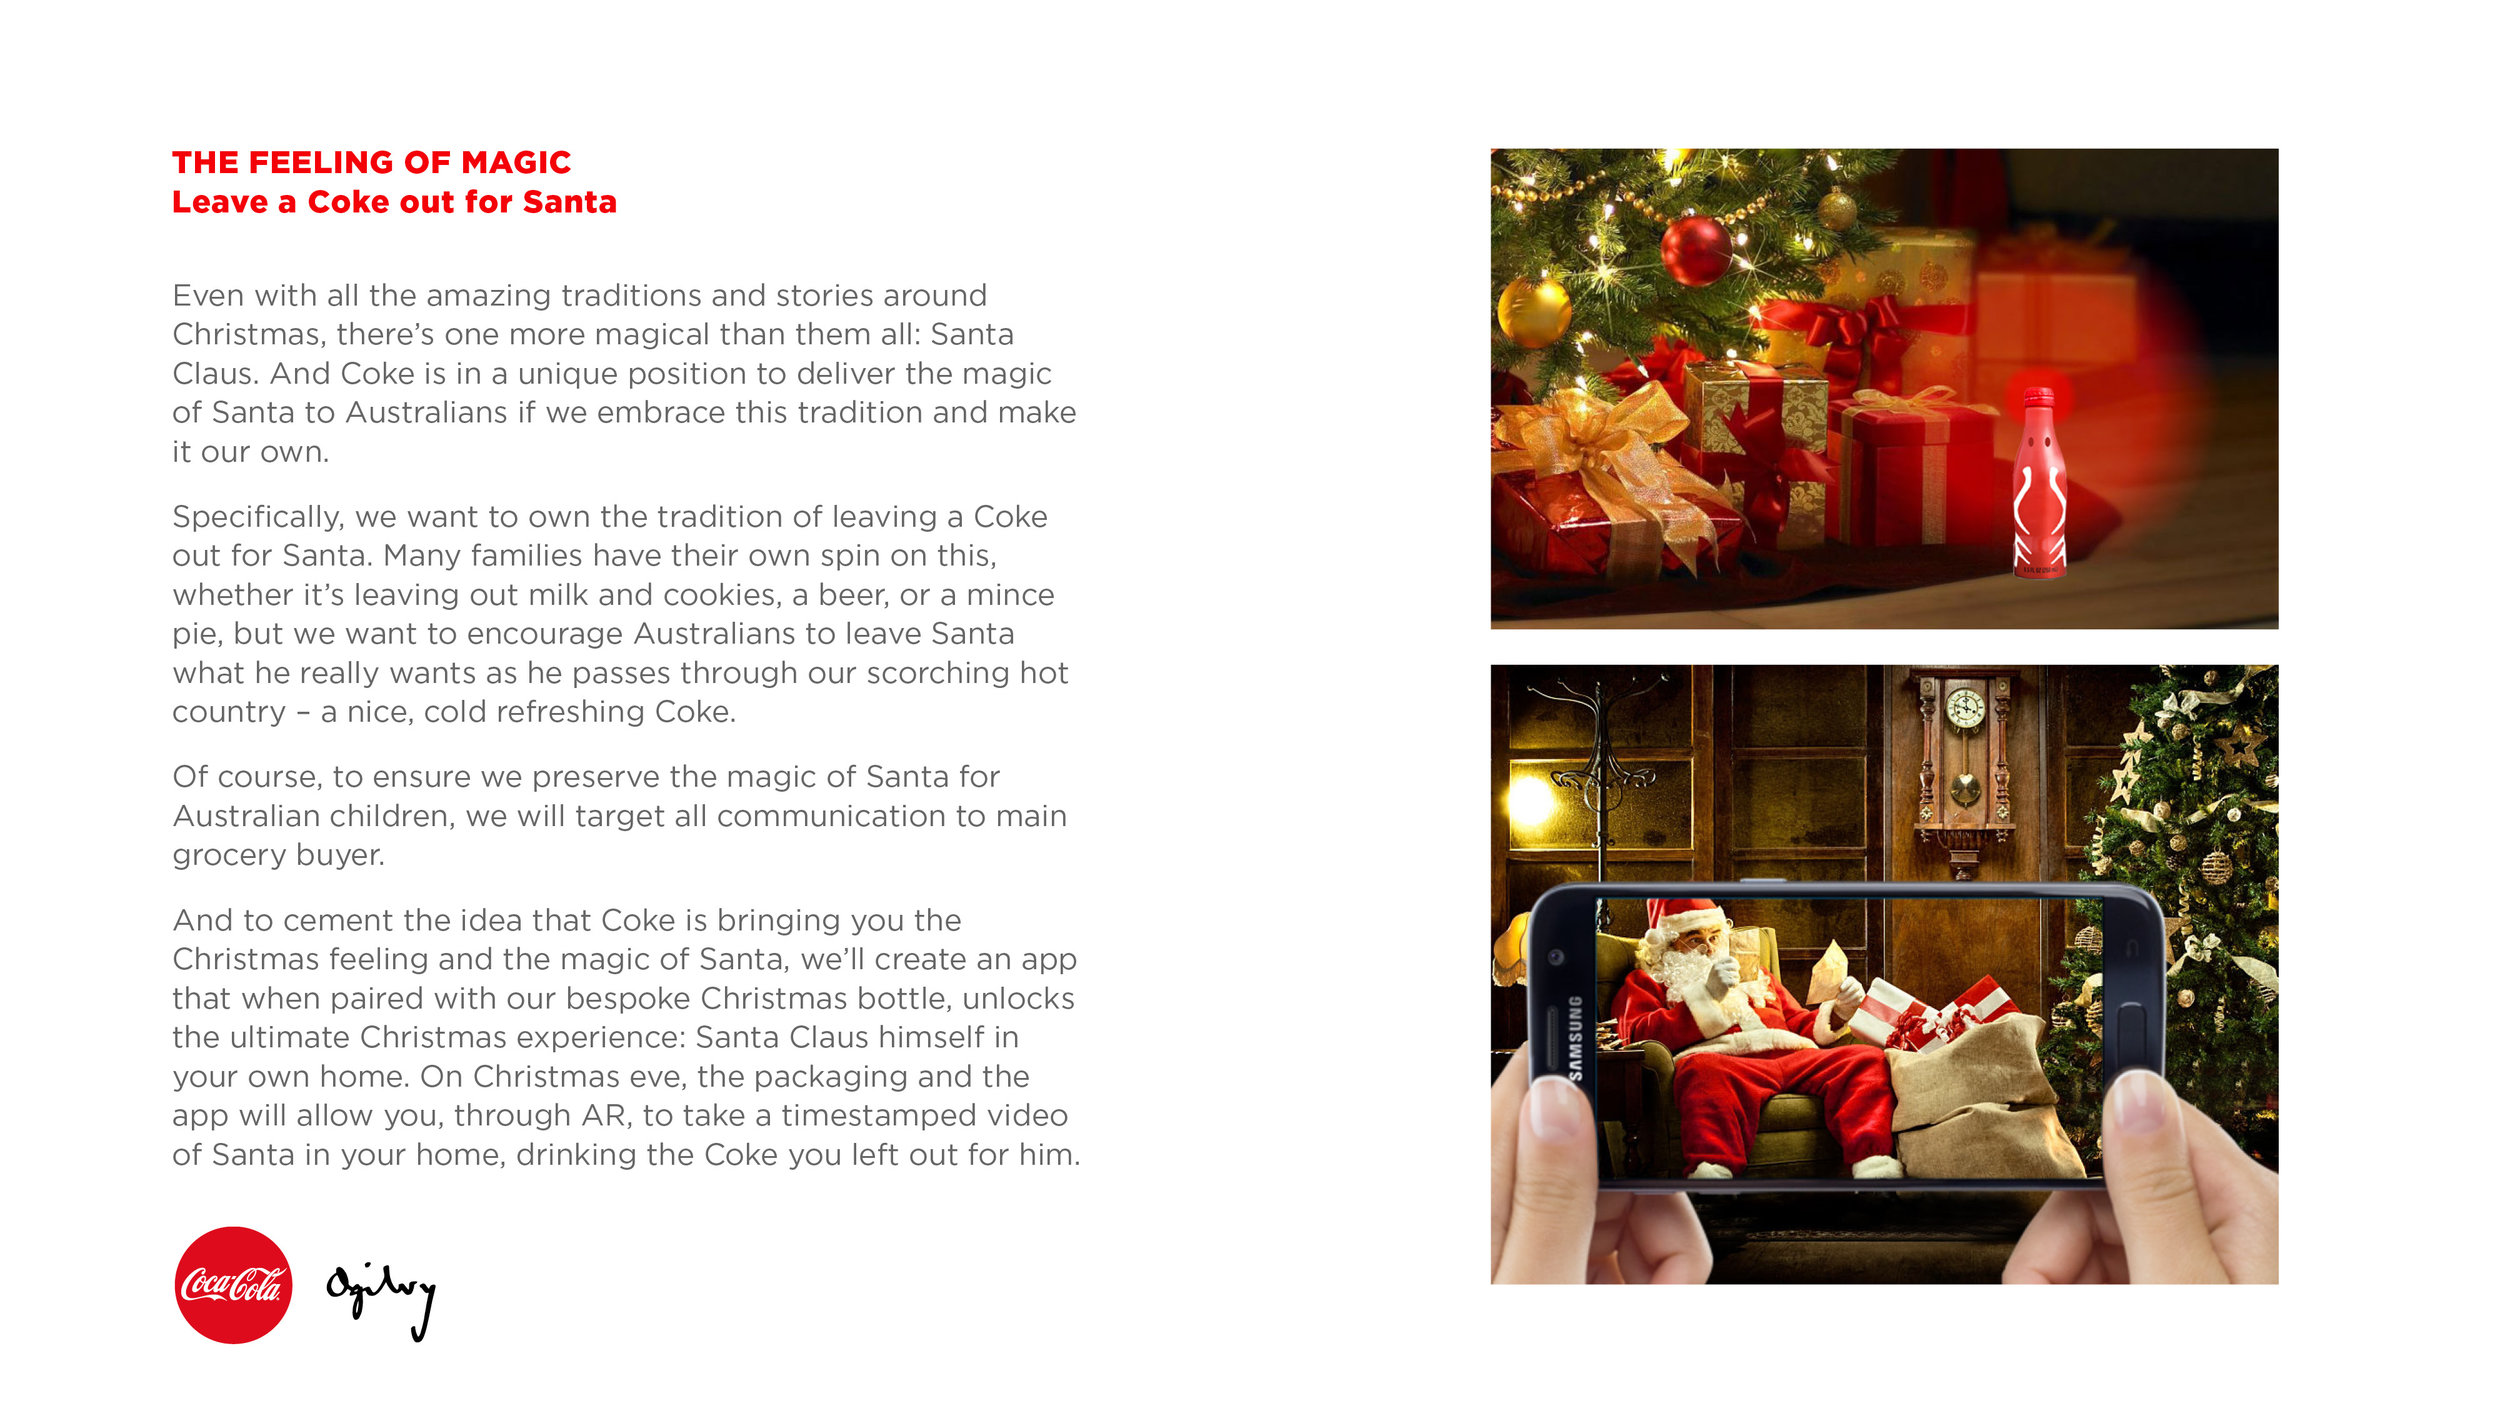 COCA-COLA CHRISTMAS (SPEC) — JLAM JLAM